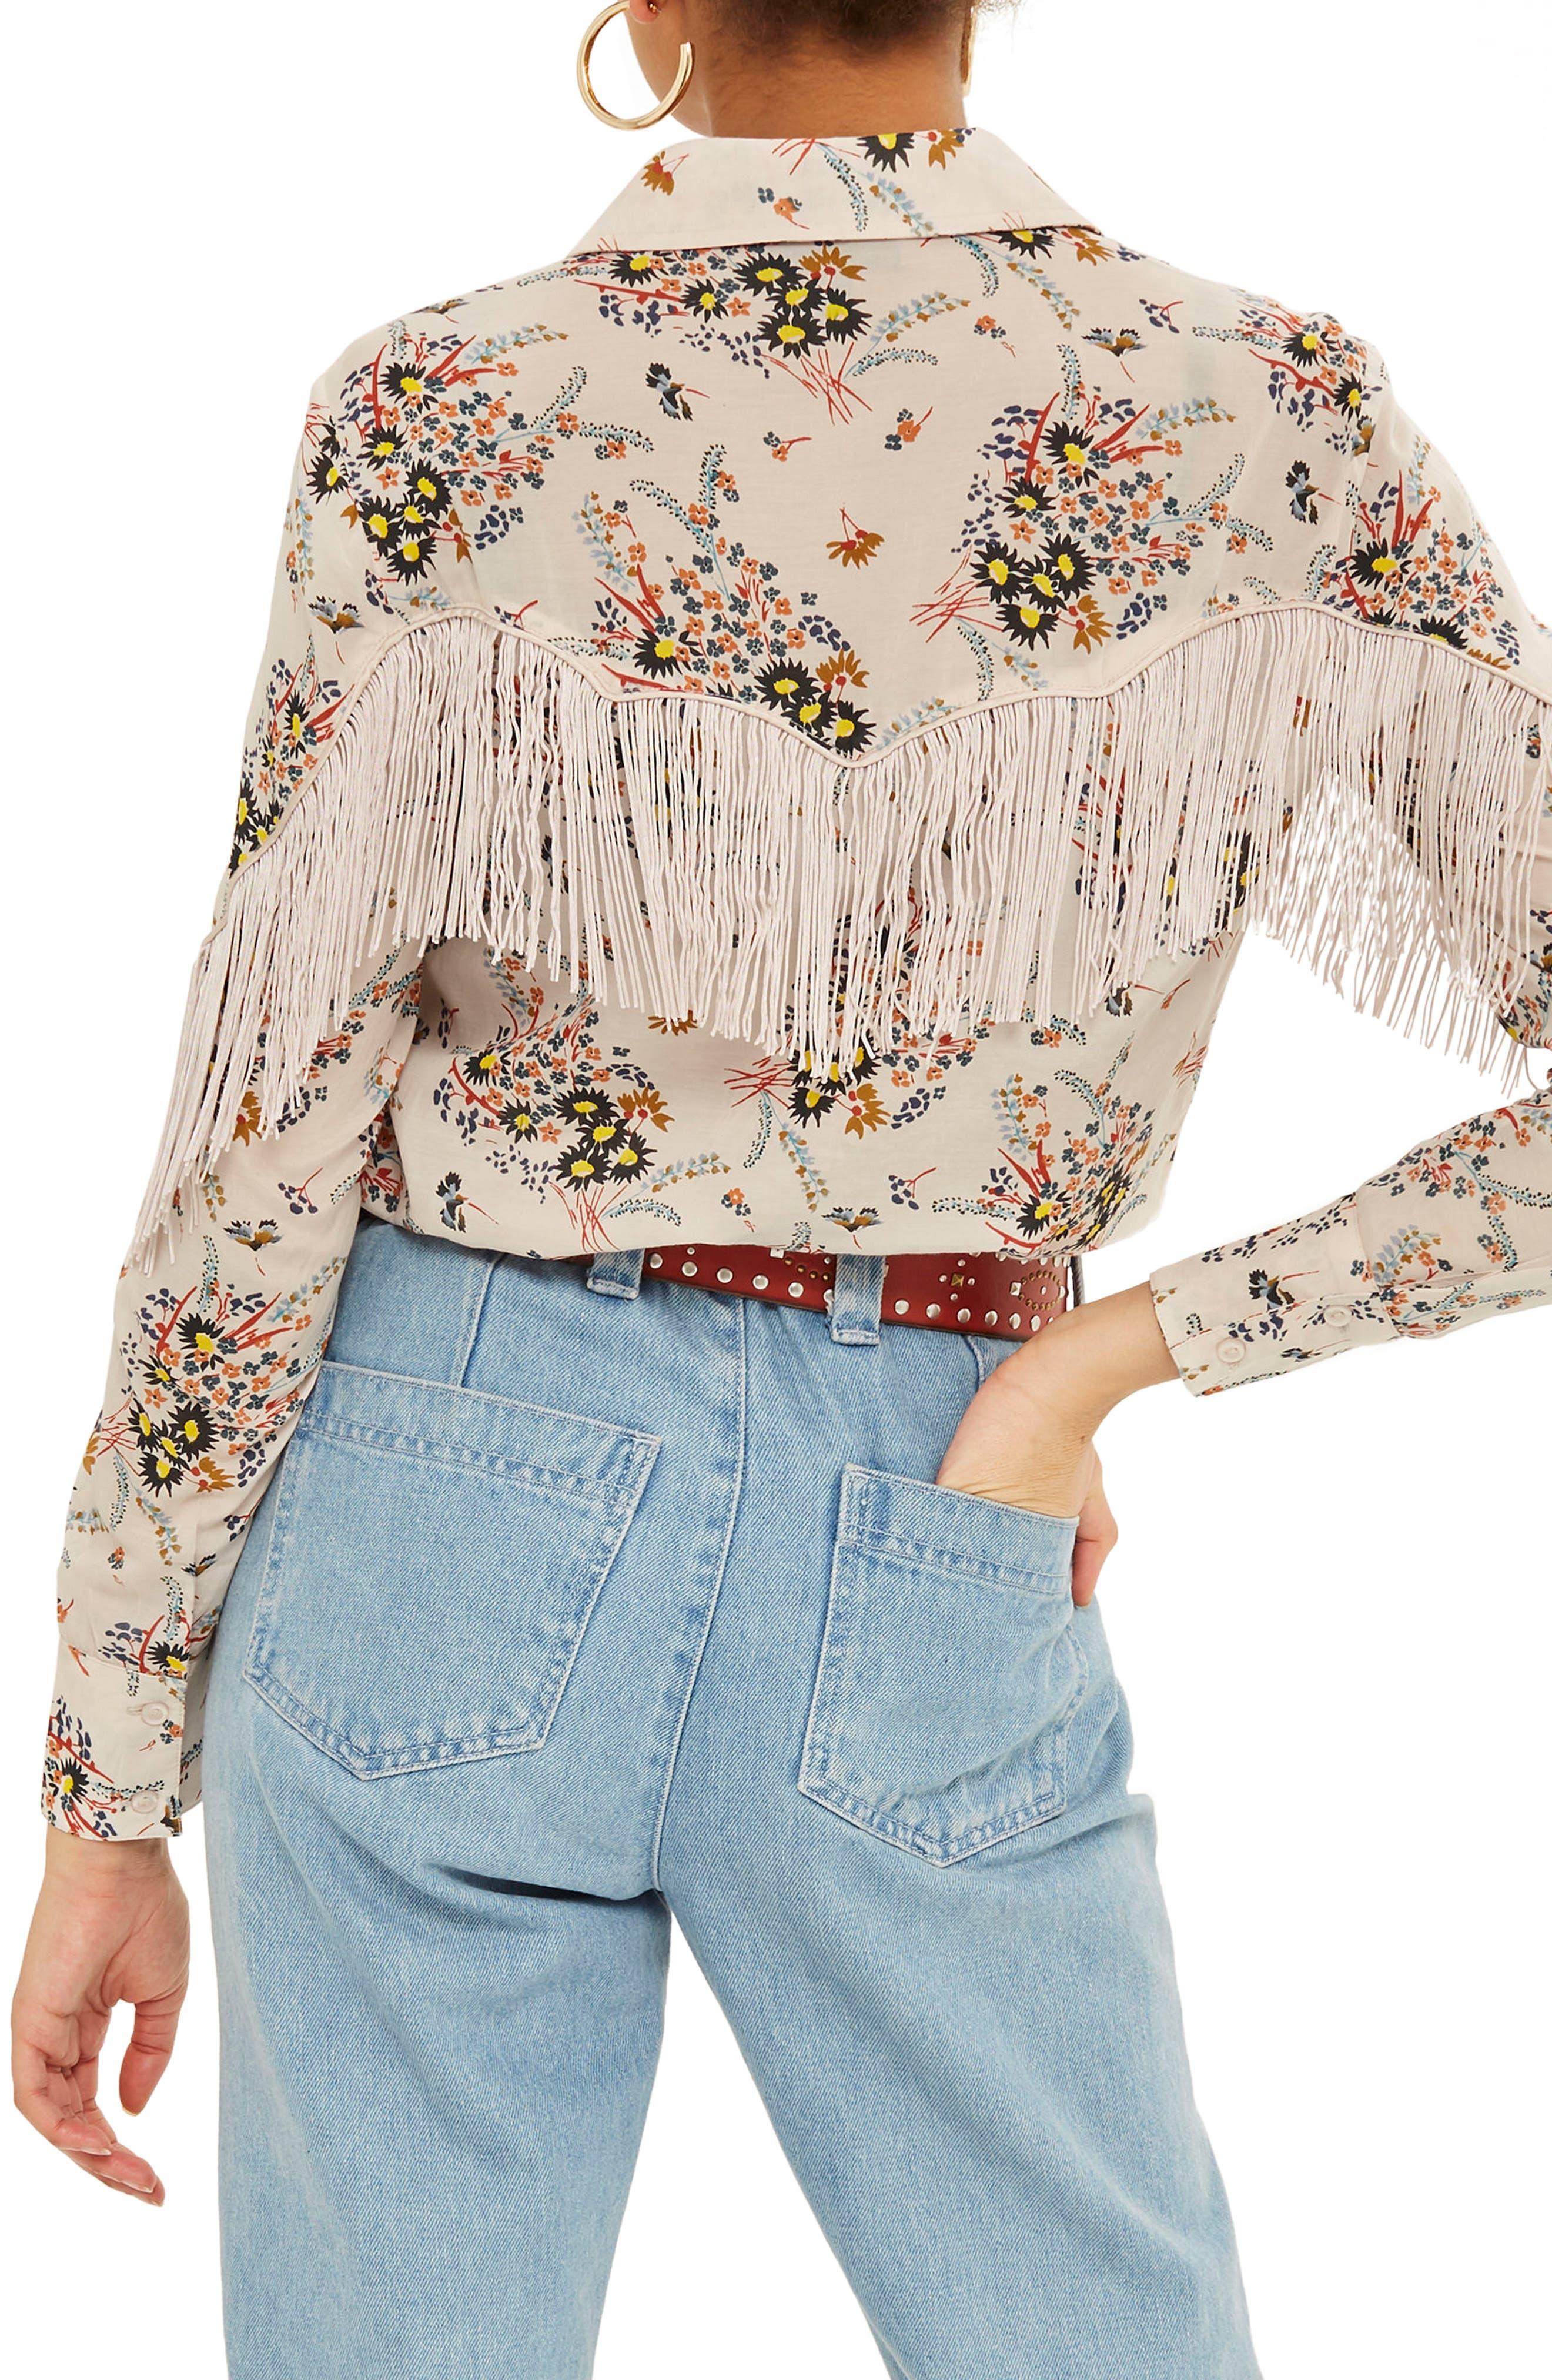 Rodeo Fringe Floral Shirt,                             Alternate thumbnail 2, color,                             Ivory Multi